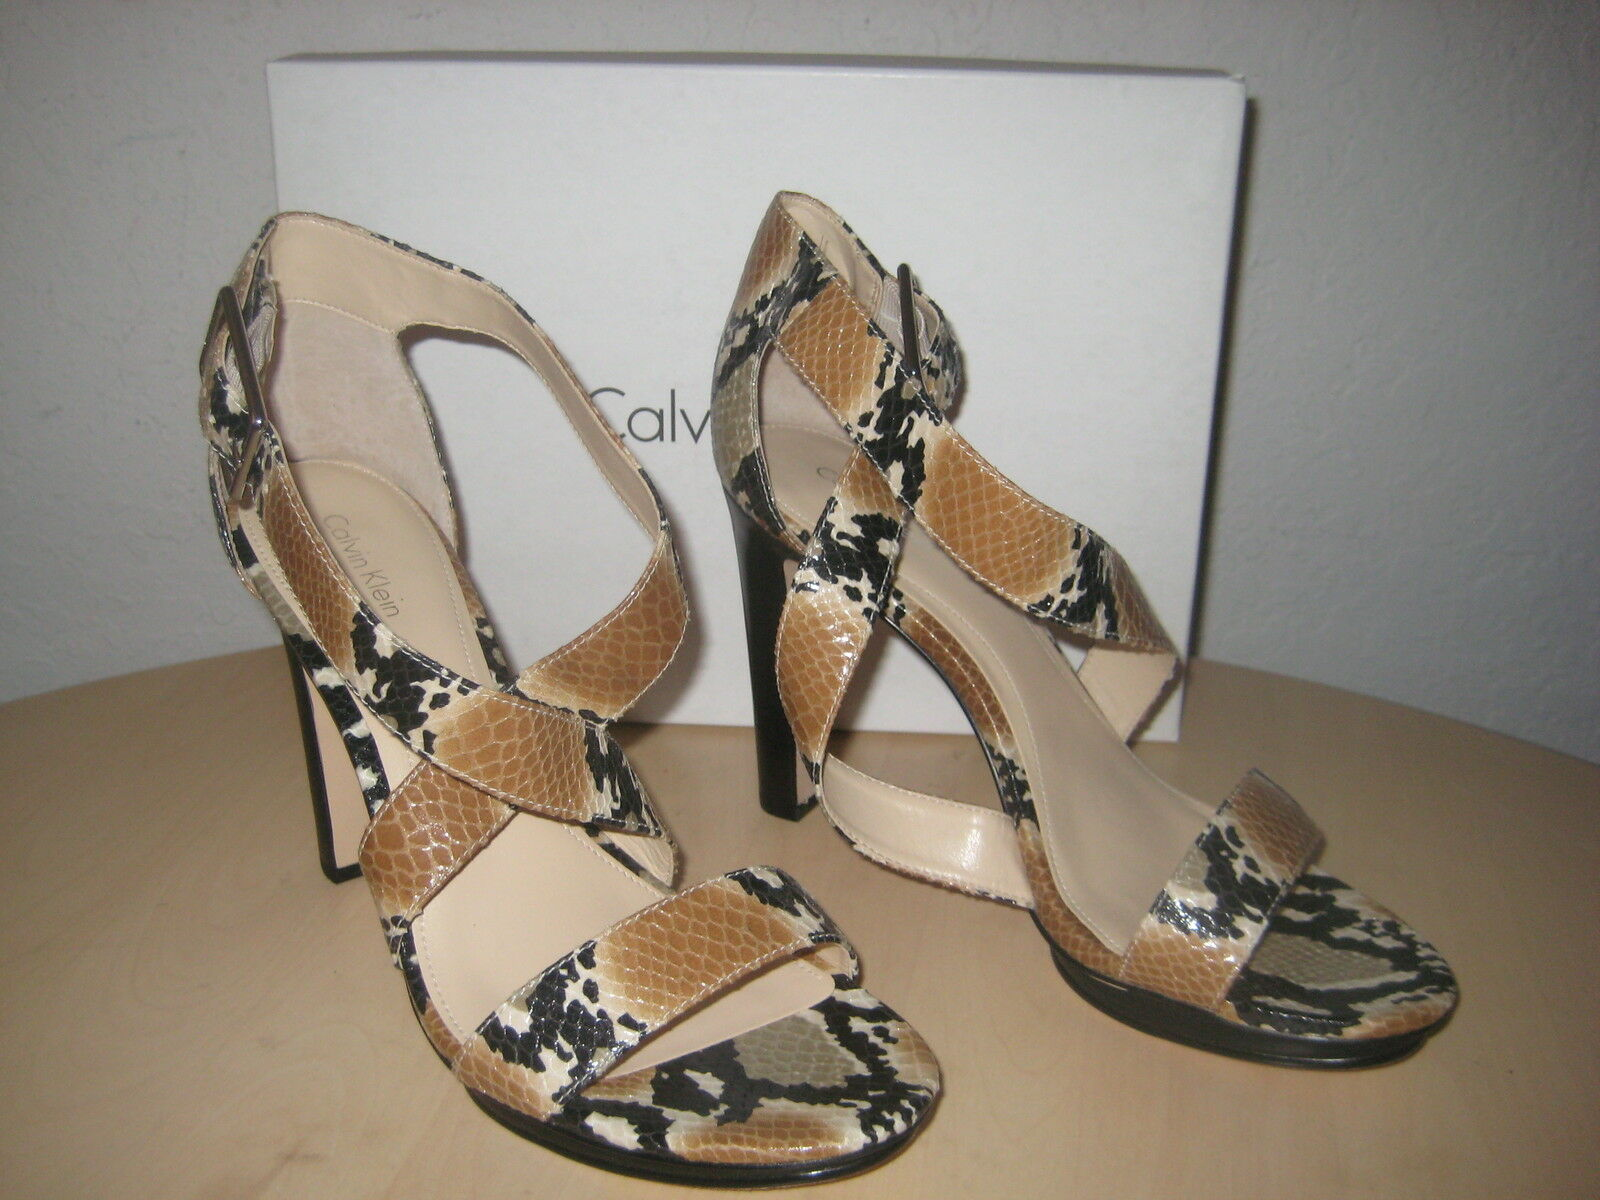 Calvin Klein Schuhes Größe 10 M Damenschuhe NEU Val Oatmeal Camel Leder Strappy Heels